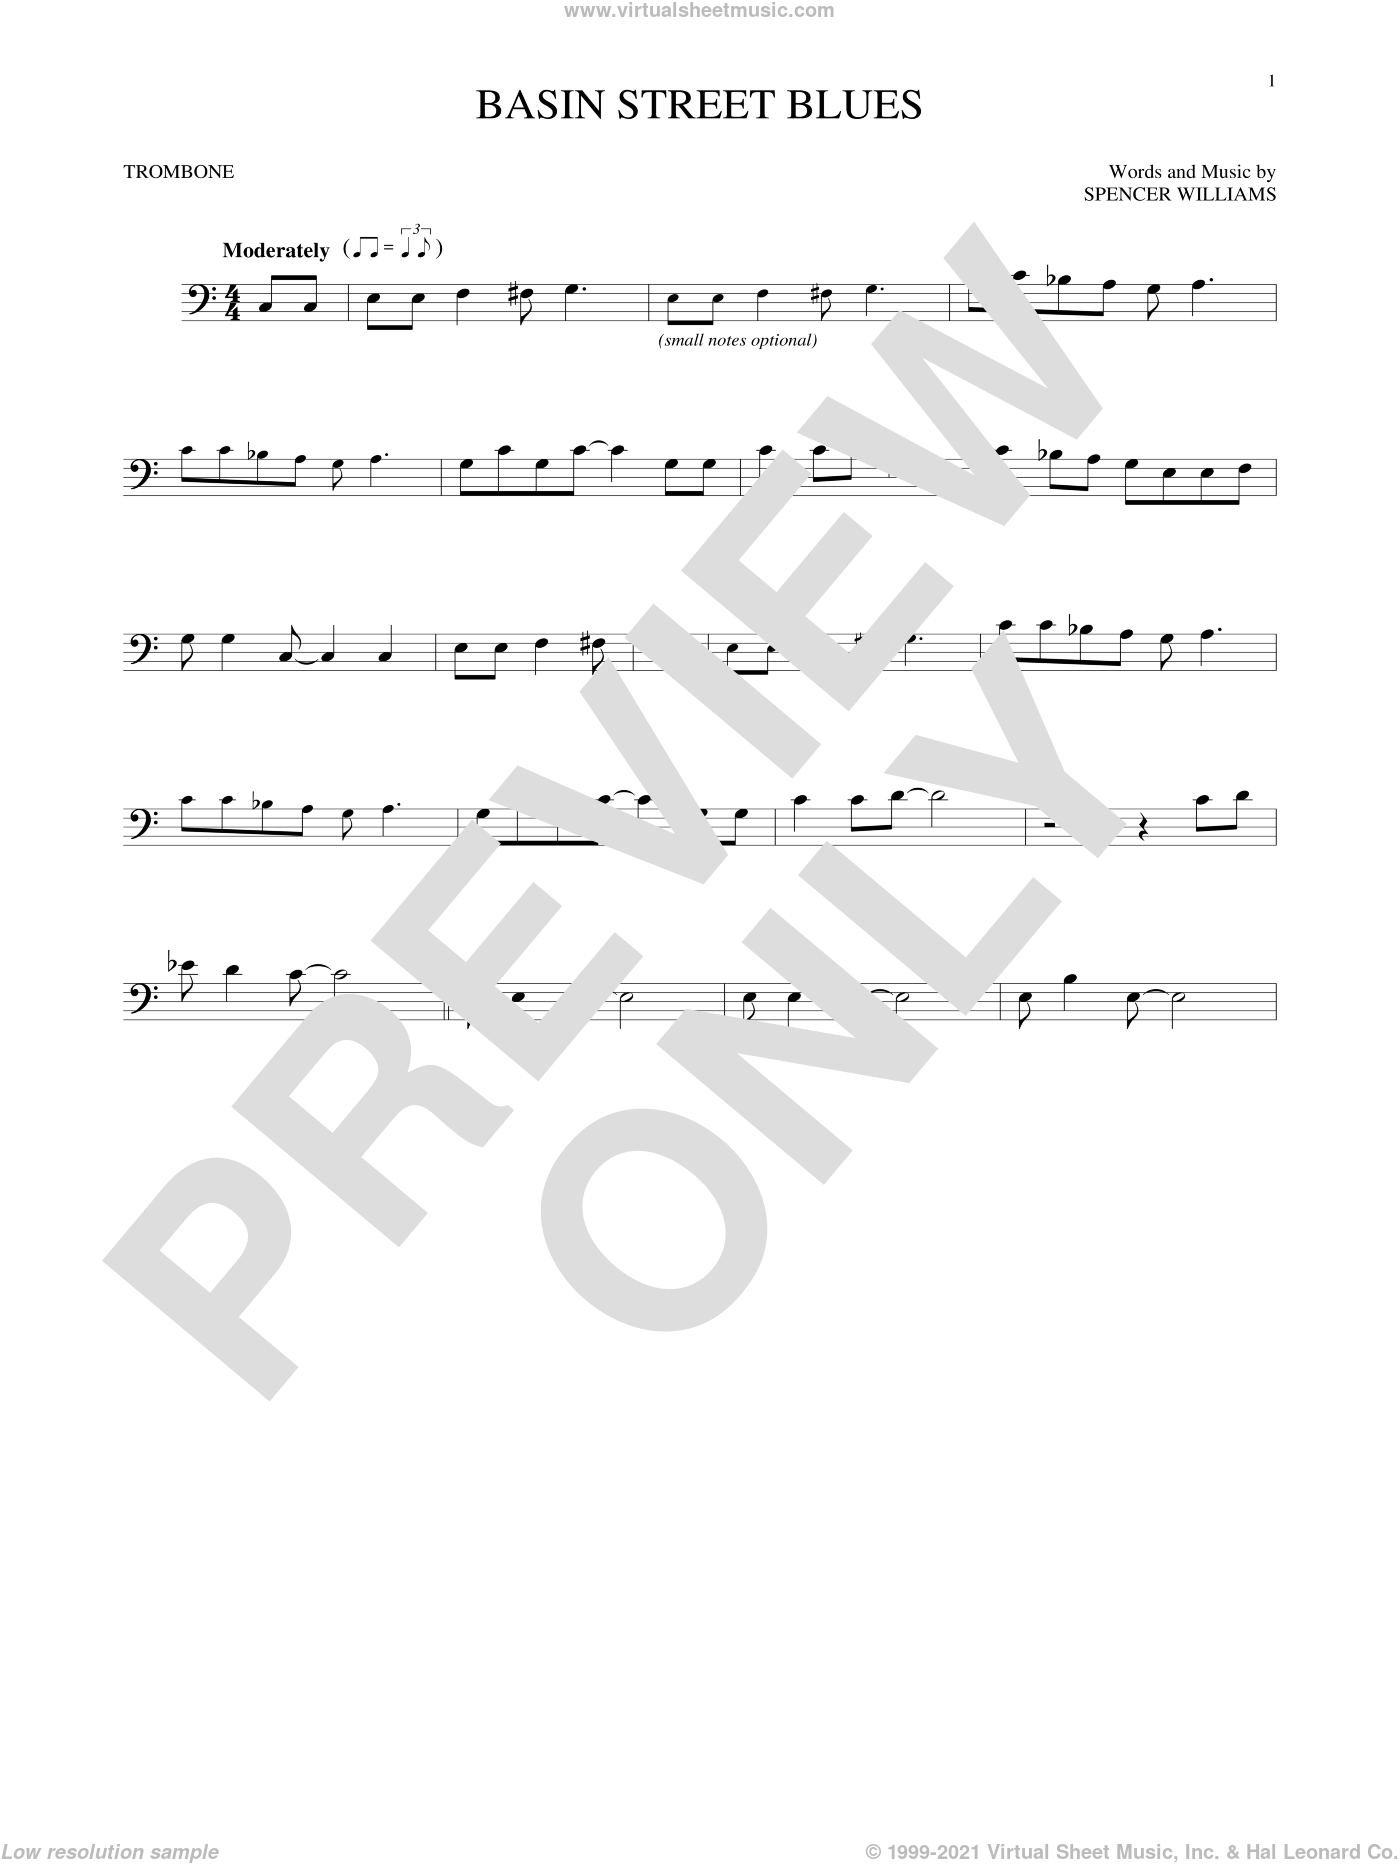 Basin Street Blues sheet music for trombone solo by Spencer Williams, intermediate skill level